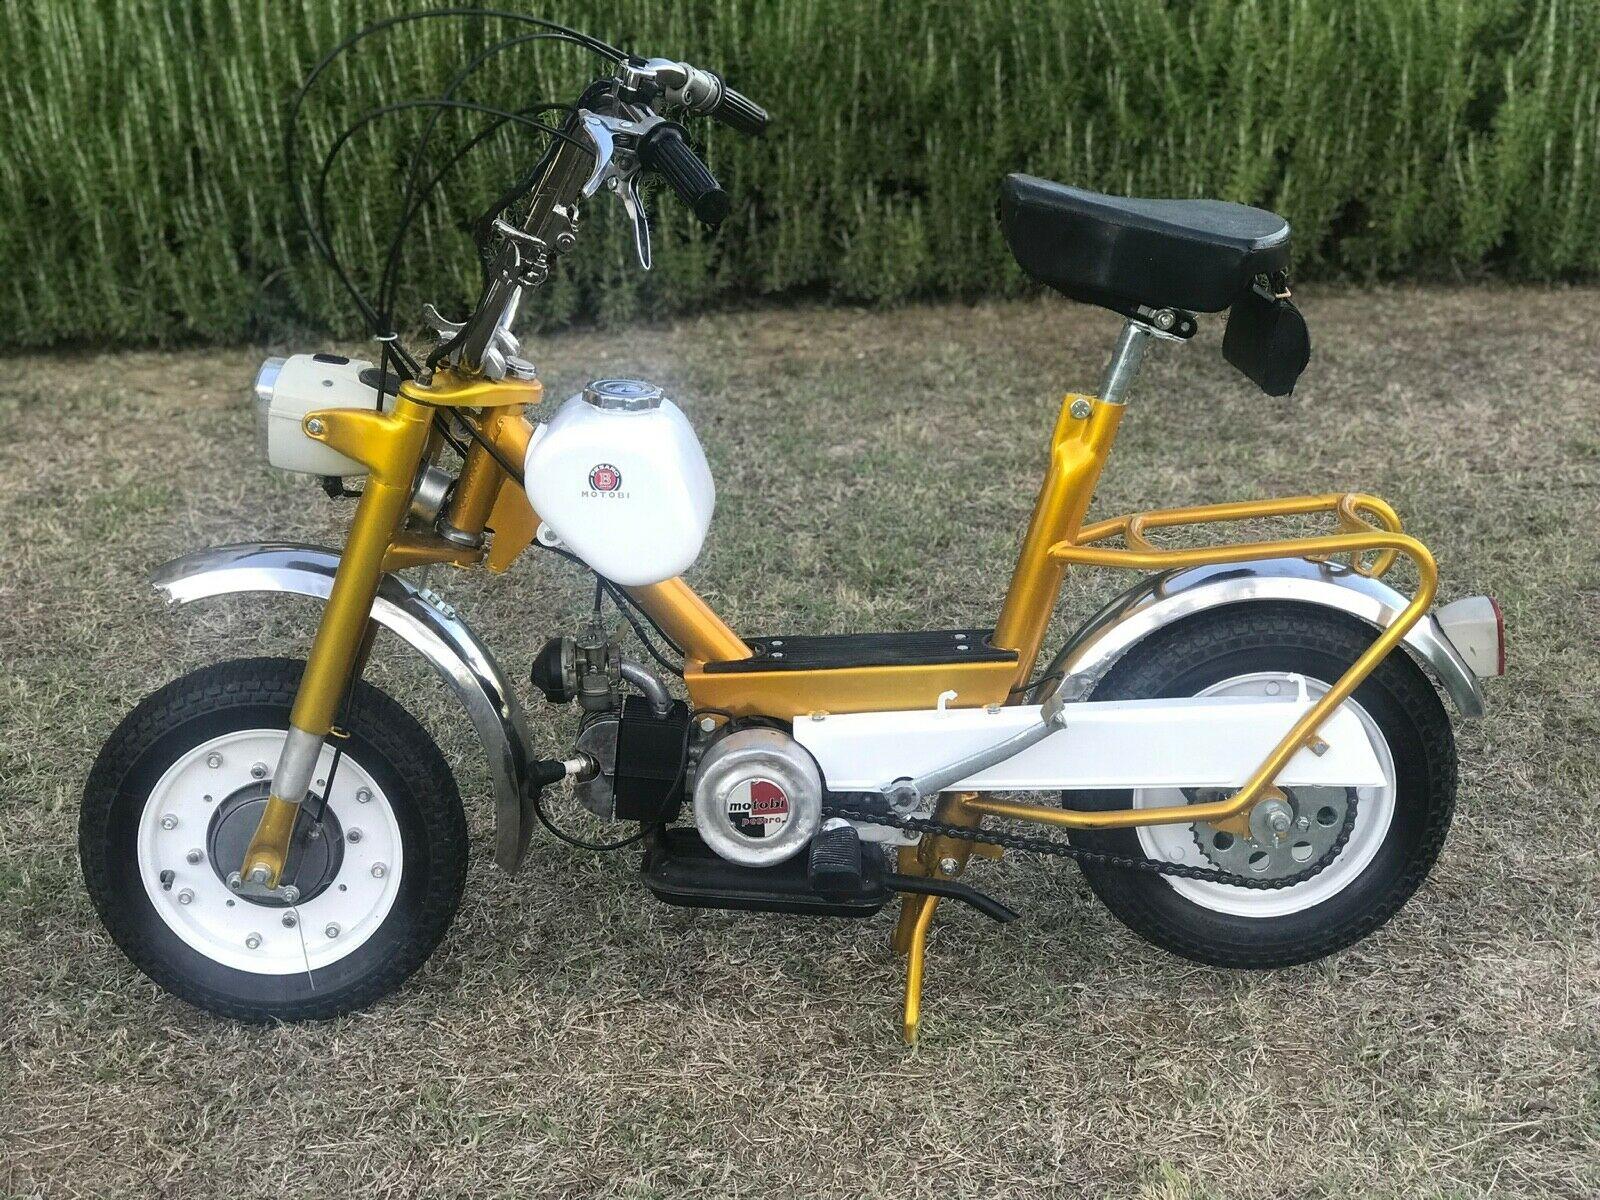 Motobi / Benelli Motorella 49cc 1970